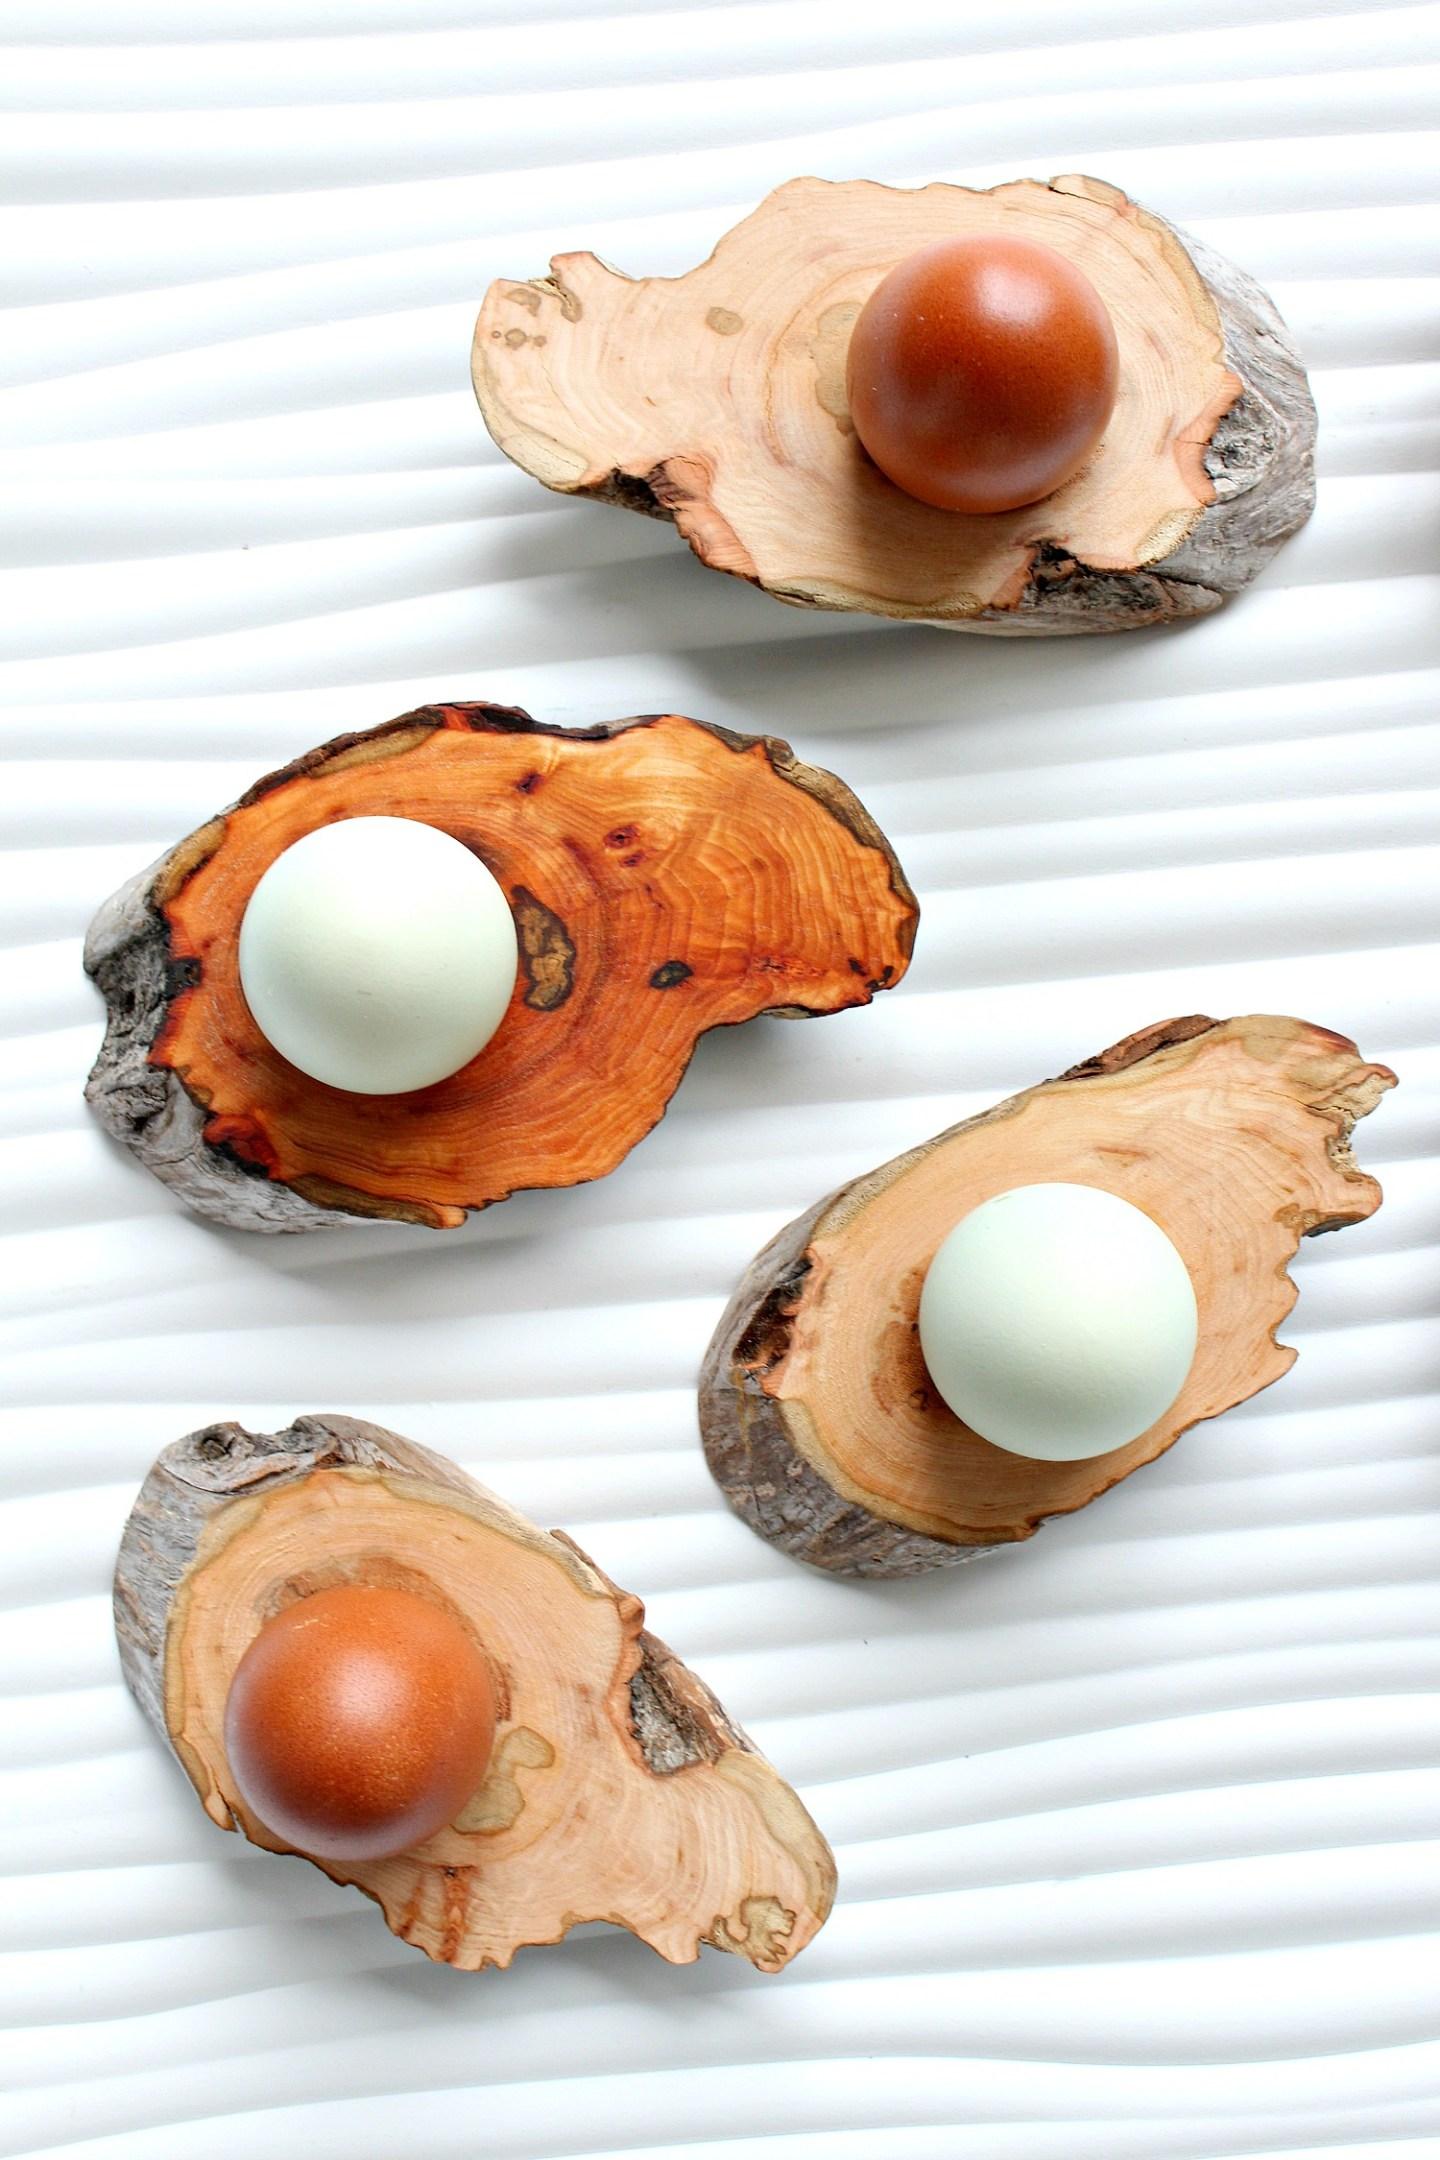 Oiled Driftwood vs. Natural